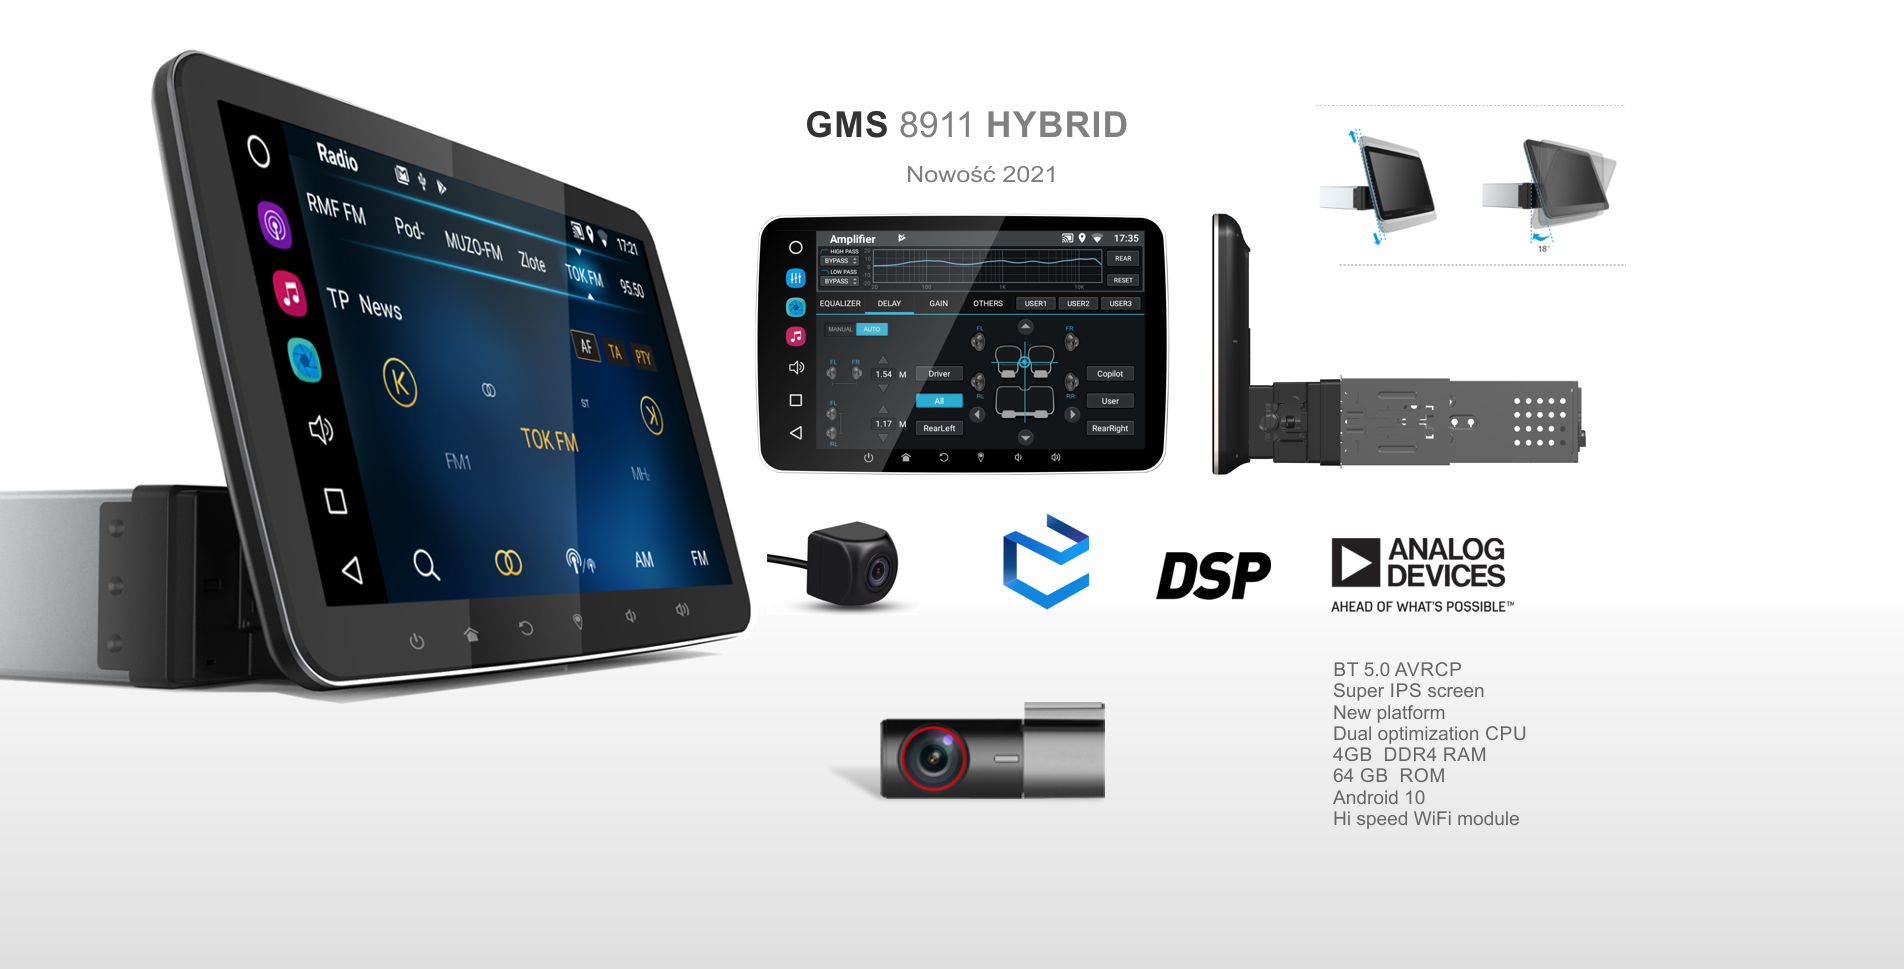 GMS 8911 HYBRIDer2